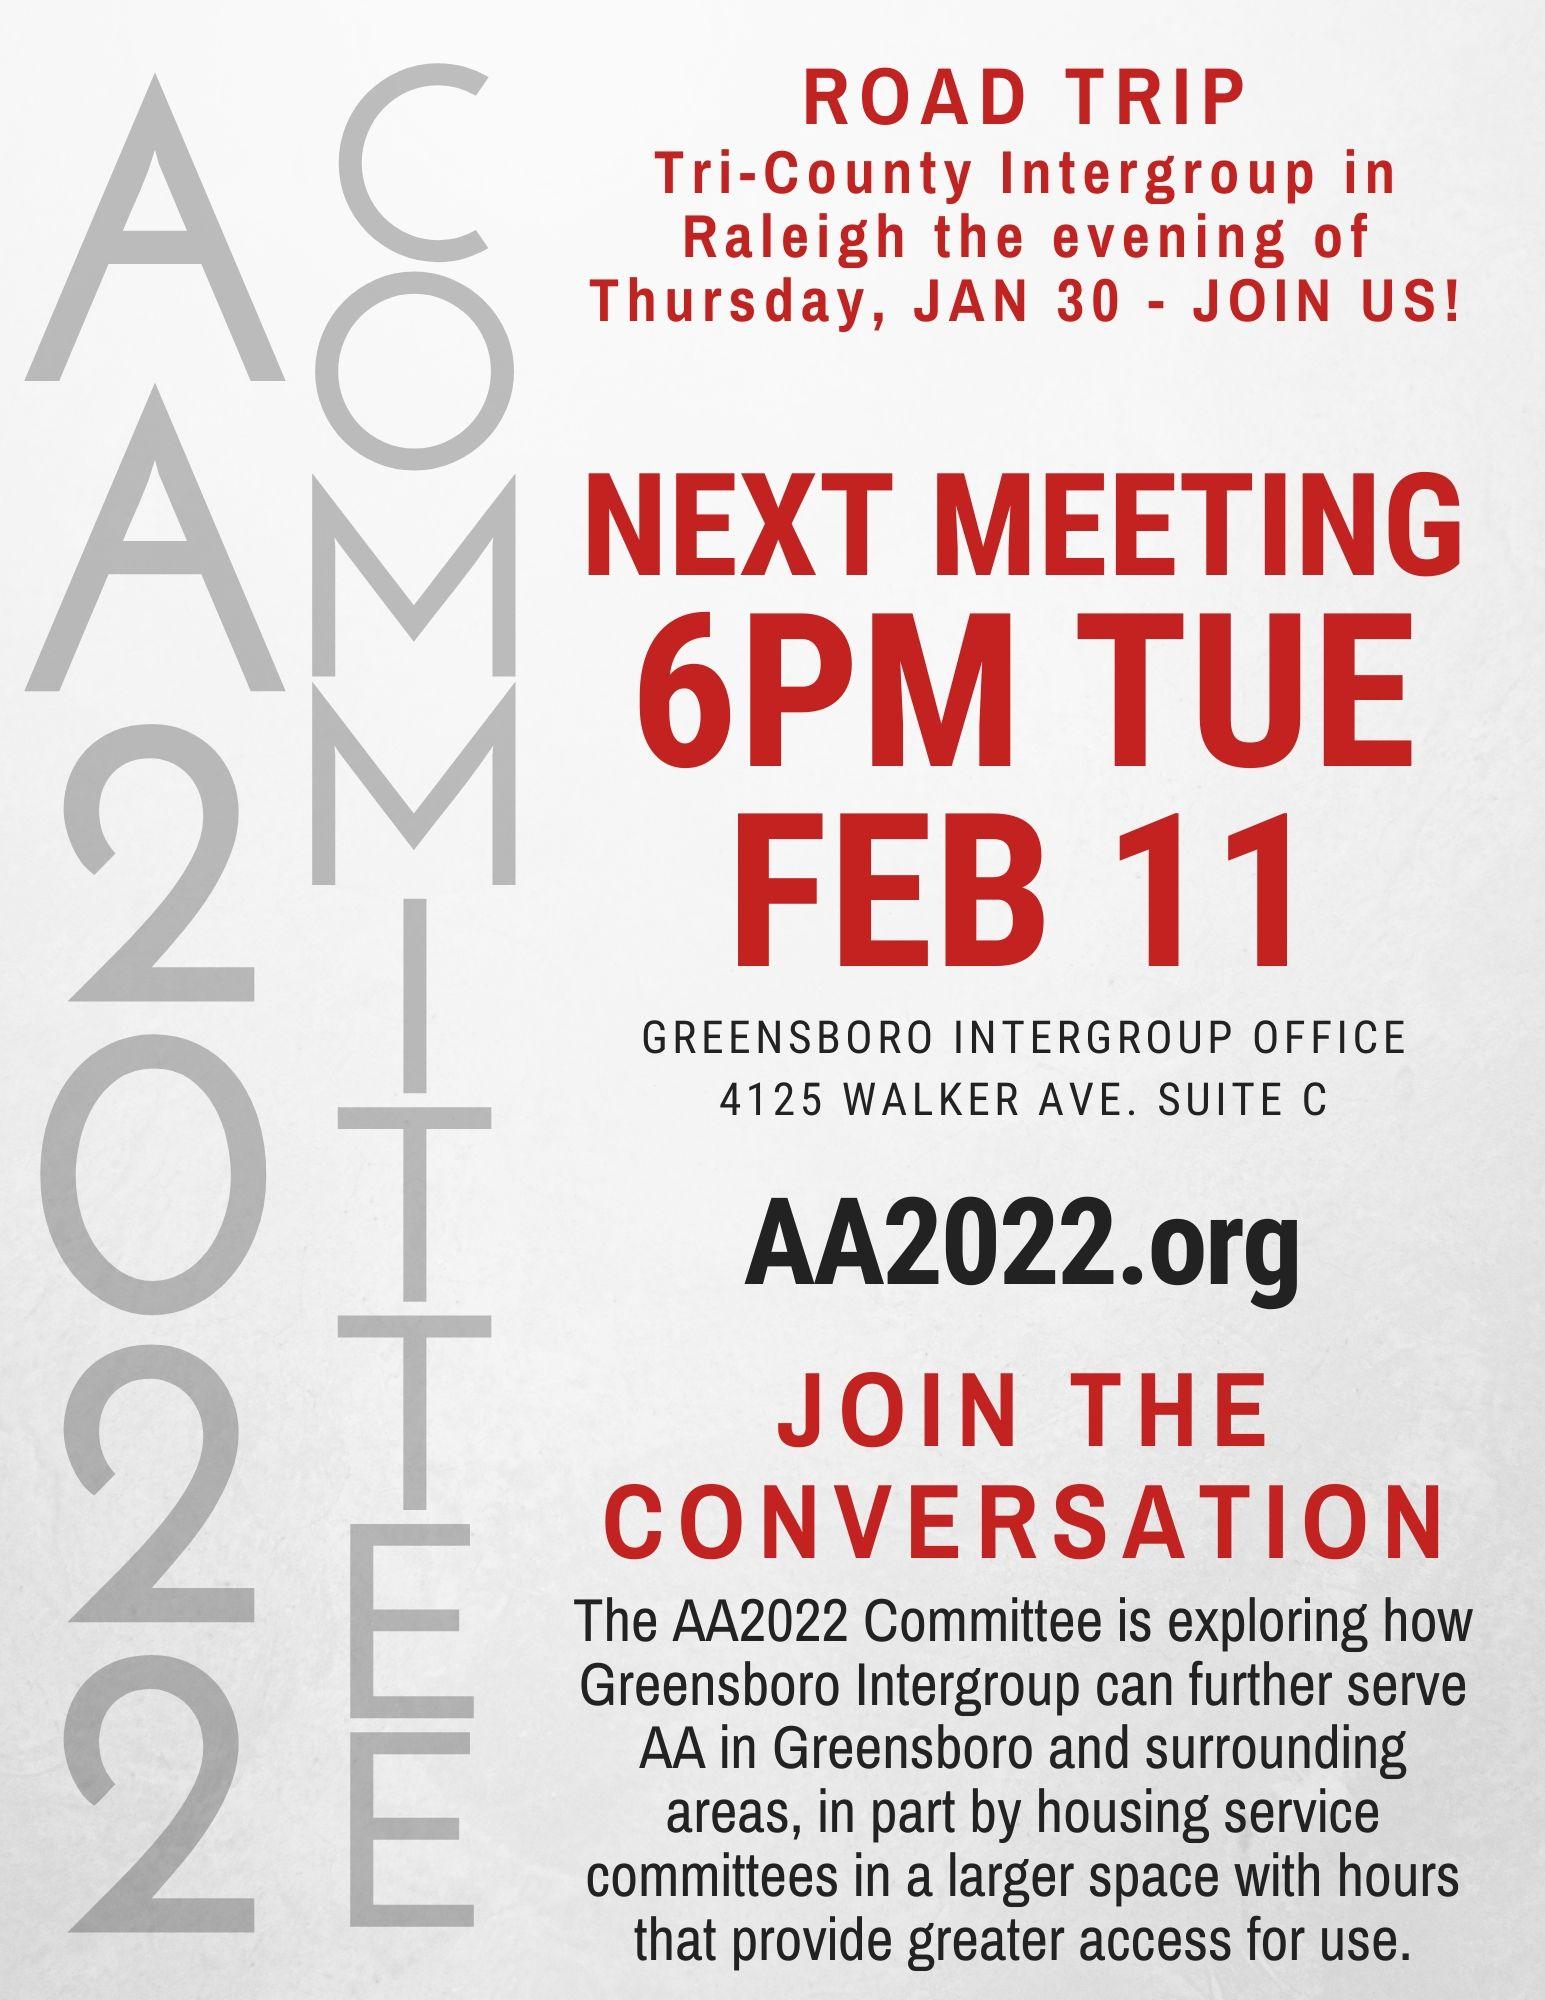 AA2022 Committee Meeting @ Greensboro Intergroup Office | Greensboro | North Carolina | United States